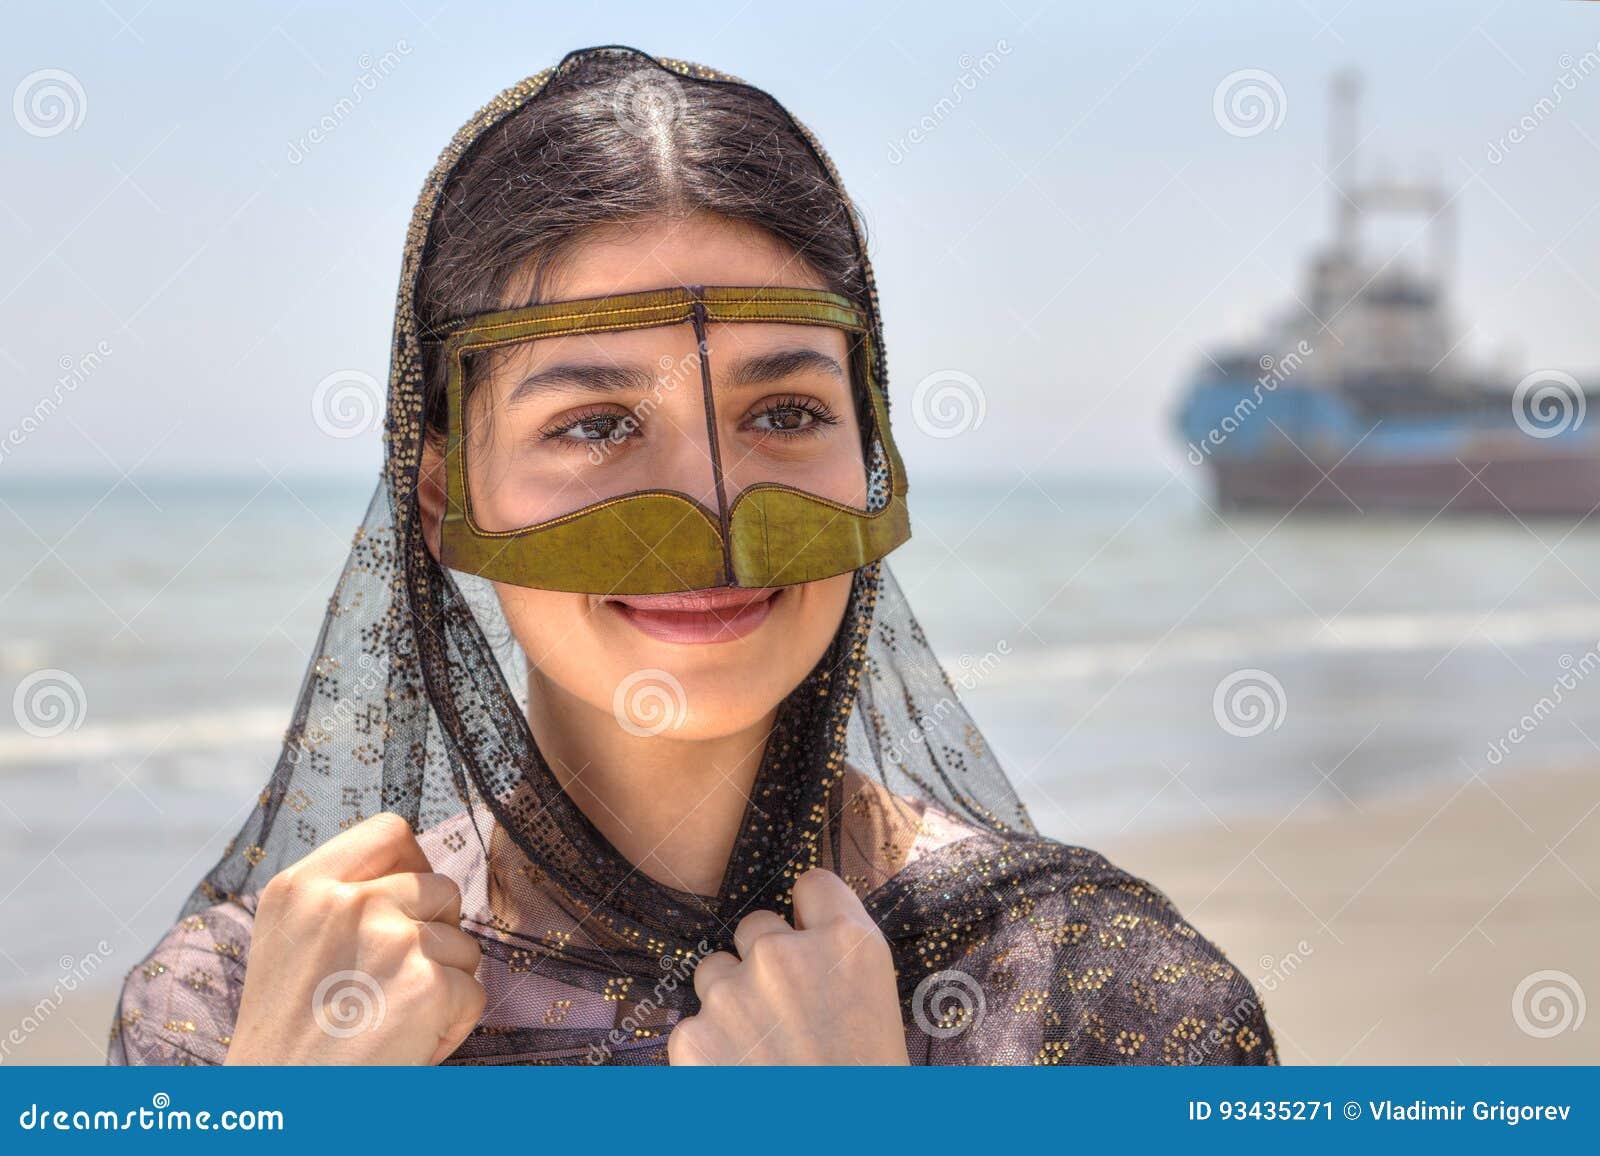 🌷 iranian teen girl